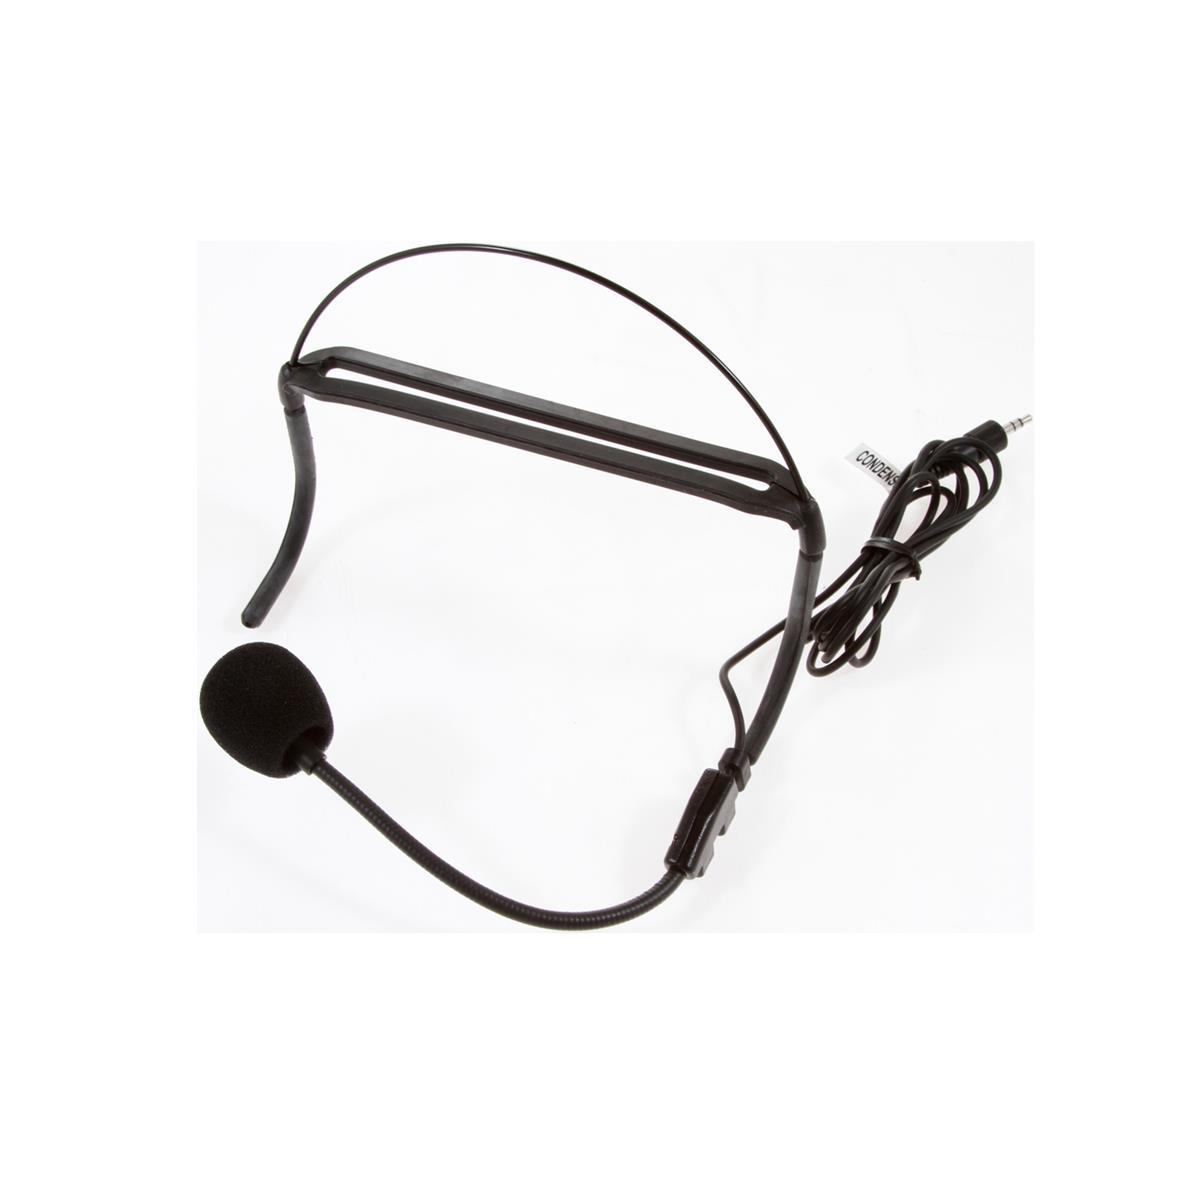 Samson-HS5-microfono-headset-per-Concert-88-sku-7649298644073